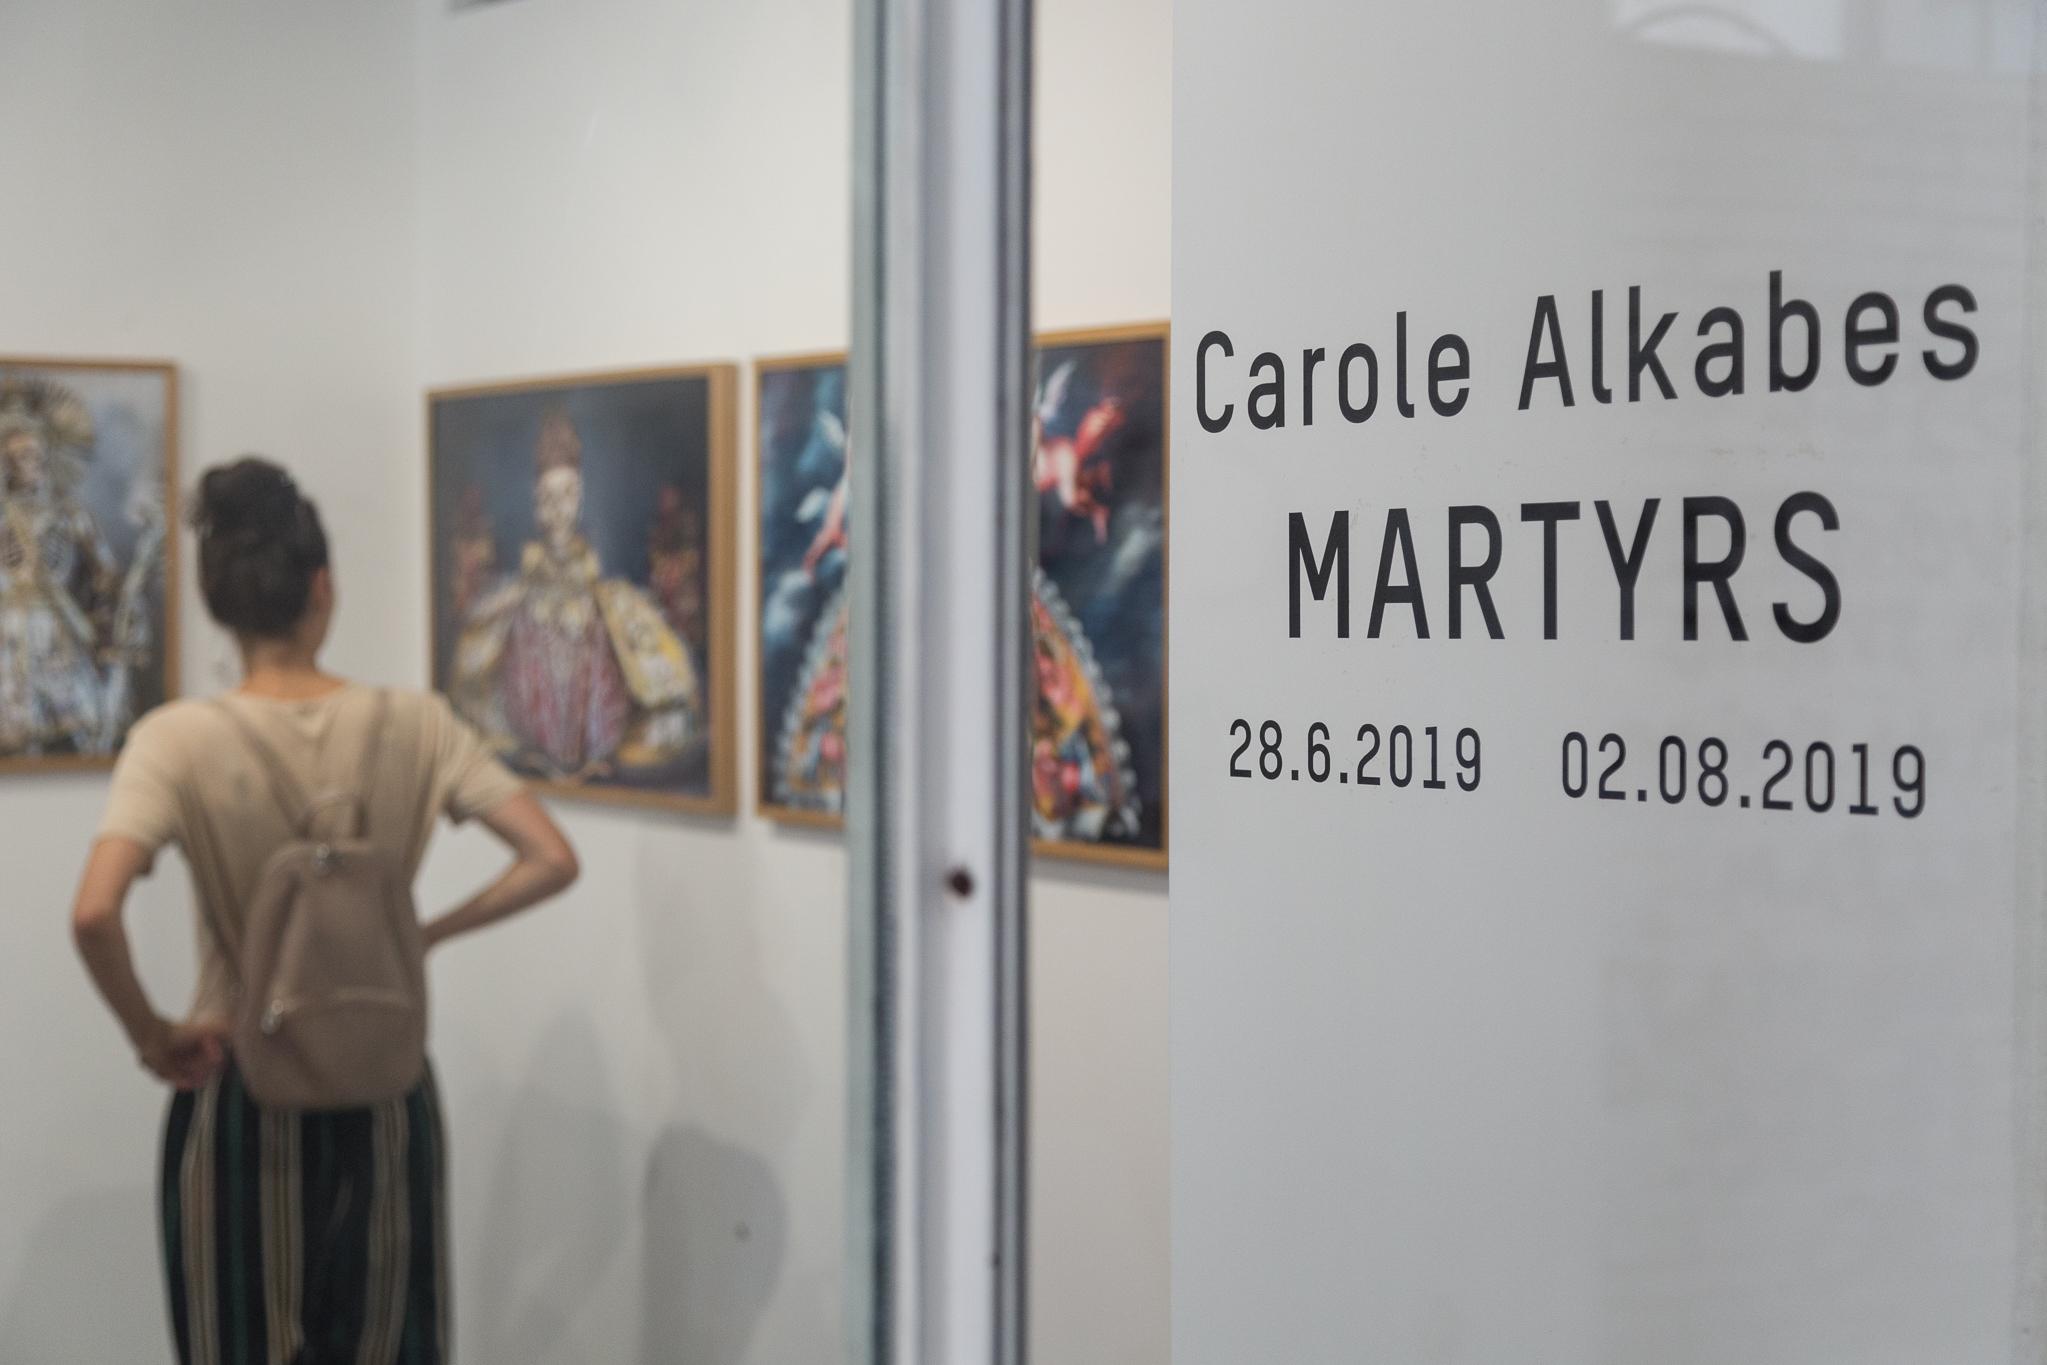 28.06.2019 - Carole Alkabes Martyrs